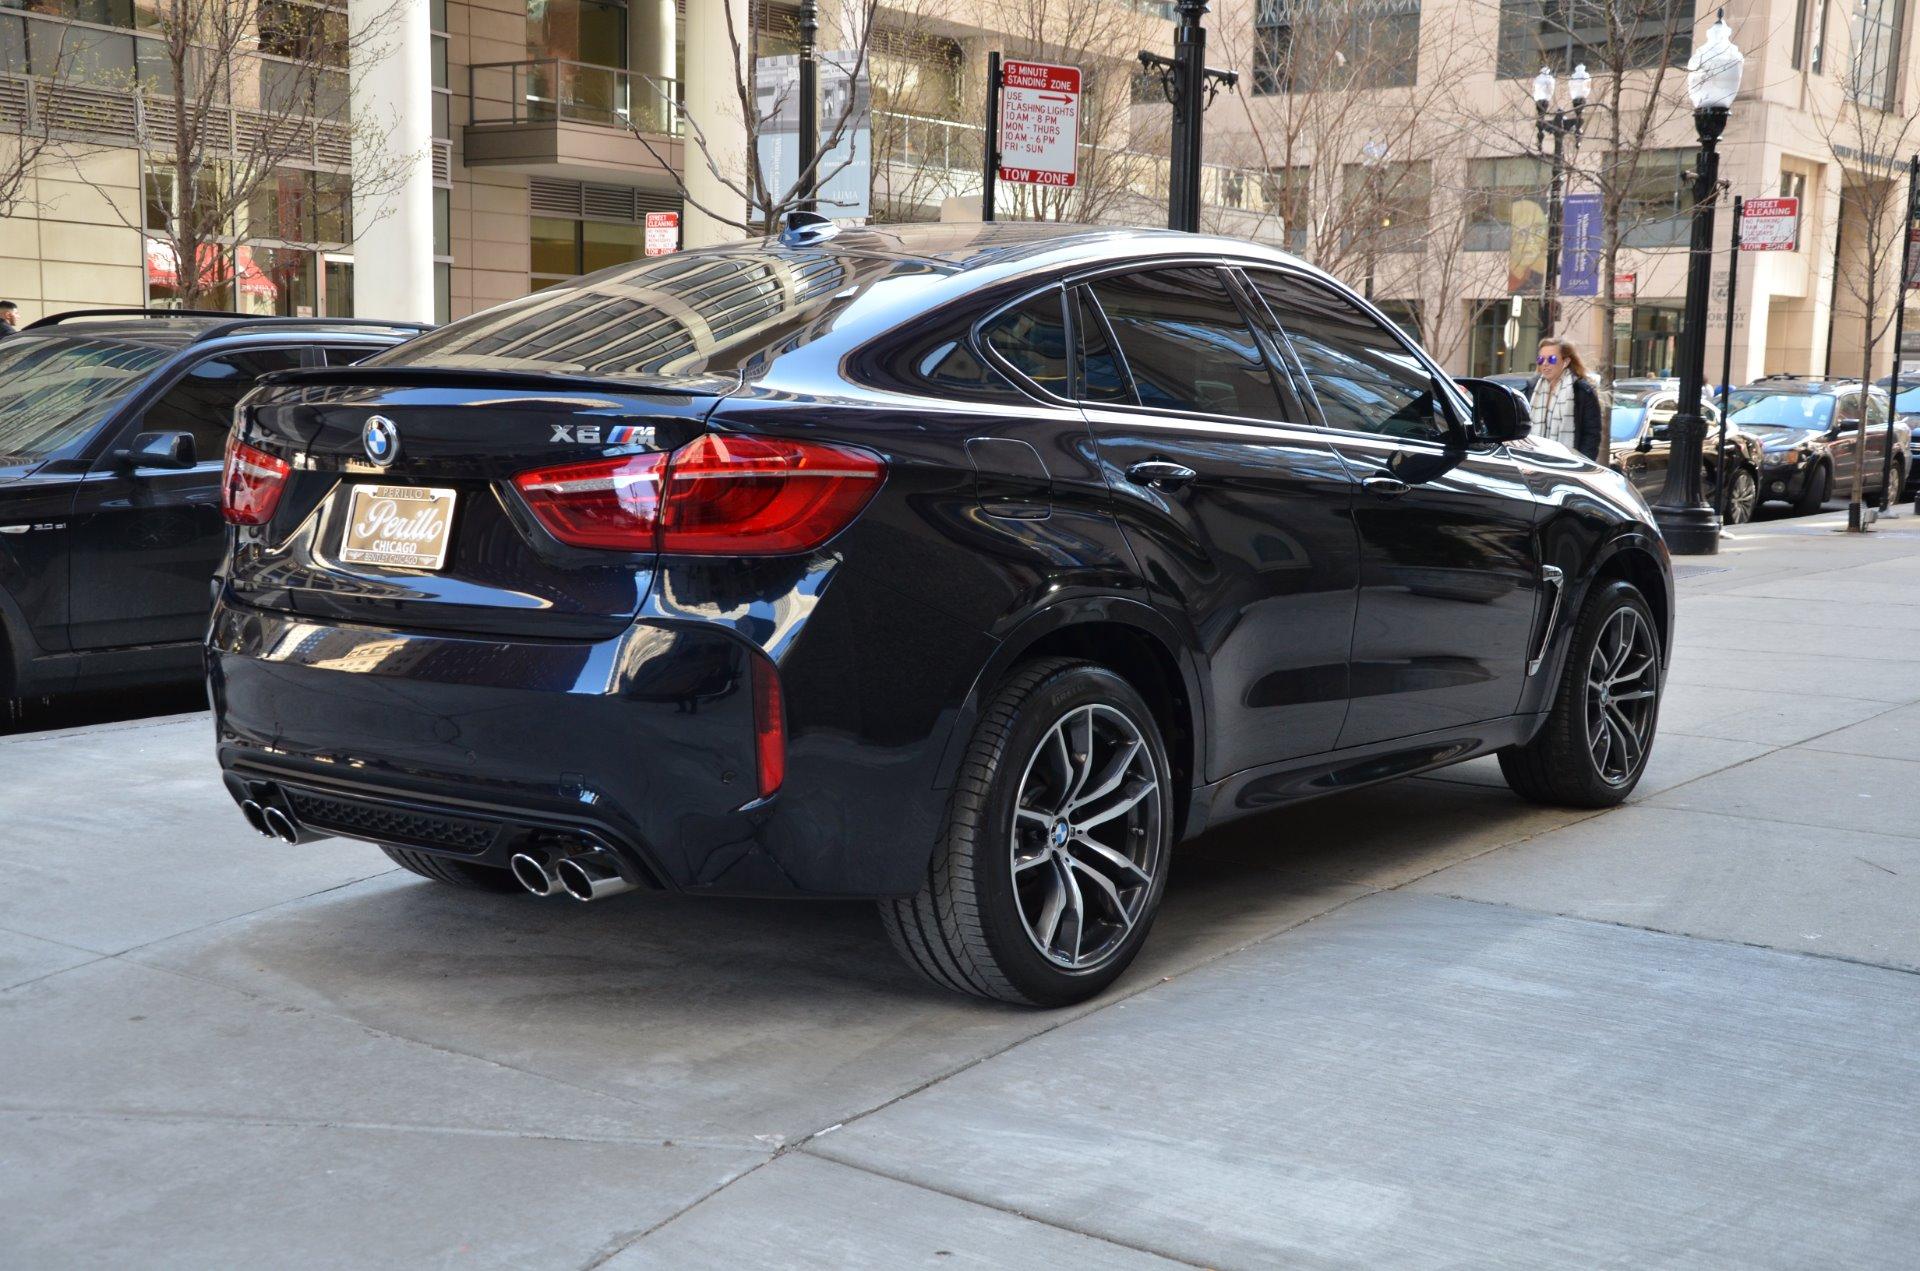 2016 Bmw X6 M Stock L249aab For Sale Near Chicago Il Il Bmw Dealer